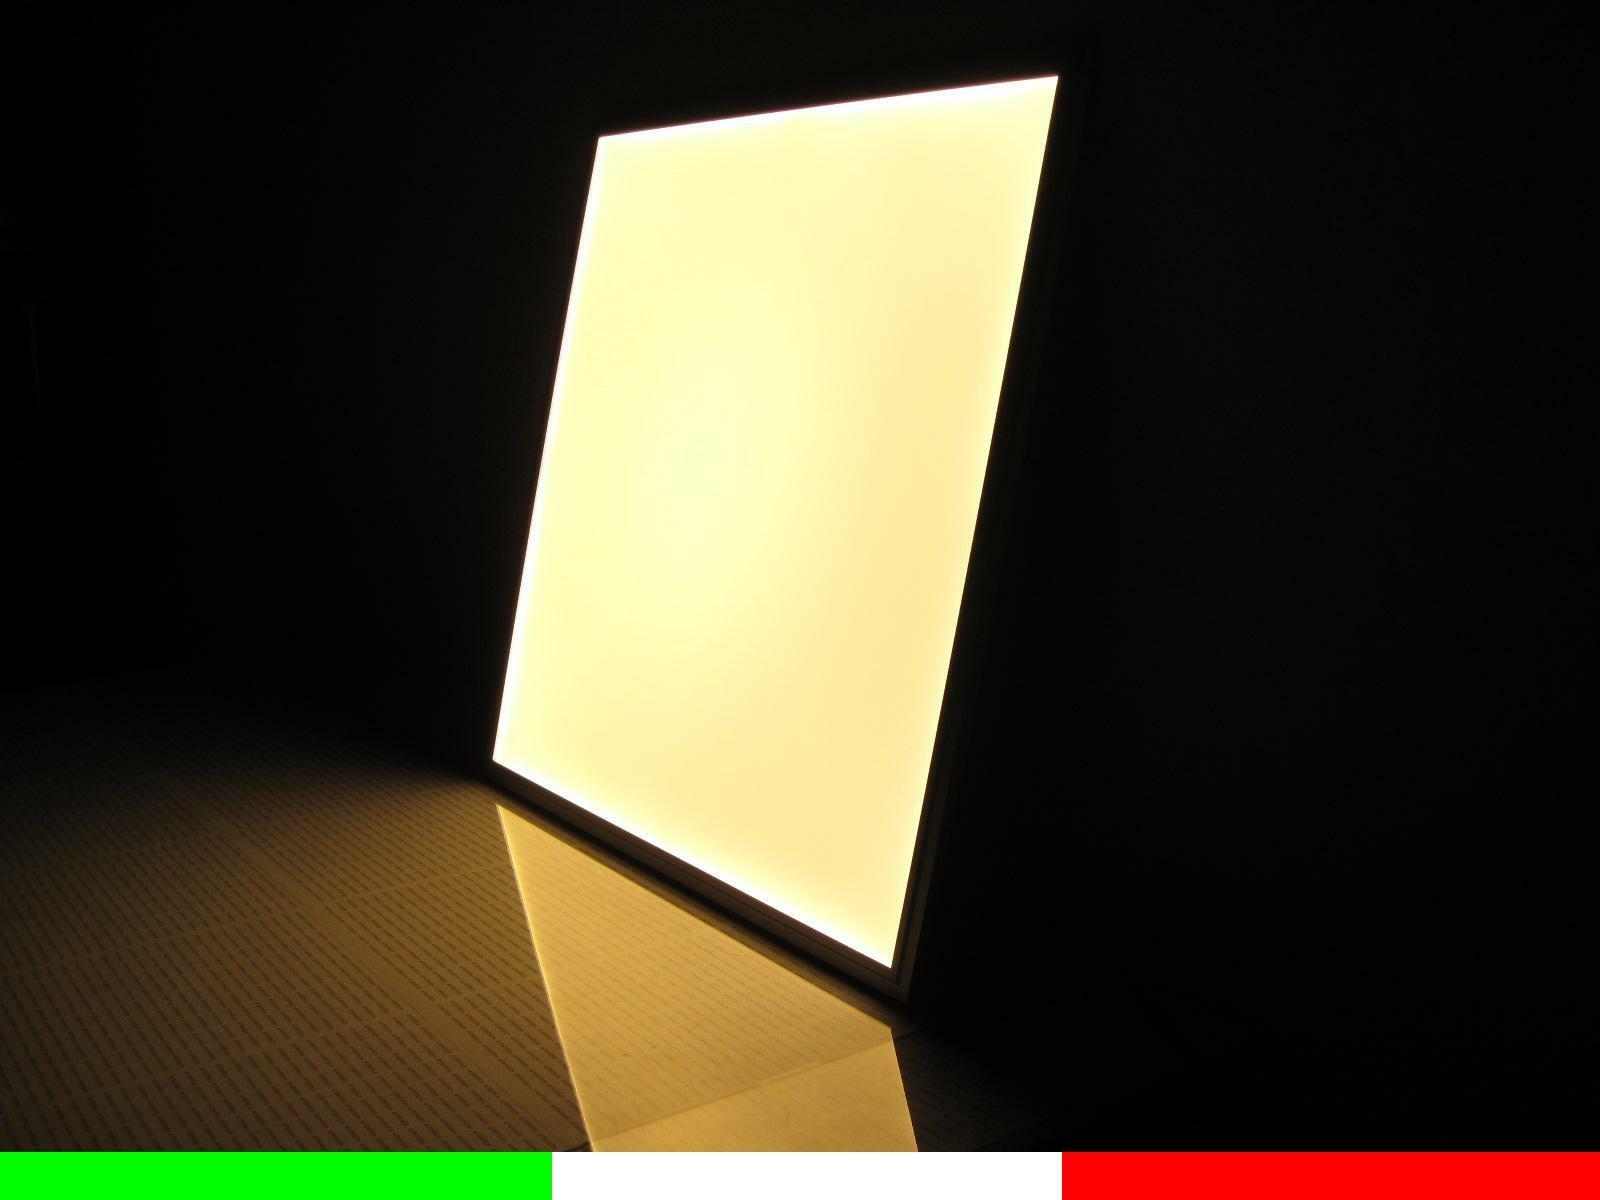 Plafoniera Luce Calda : Plafoniera a led watt luce calda elcart  elettrosiste